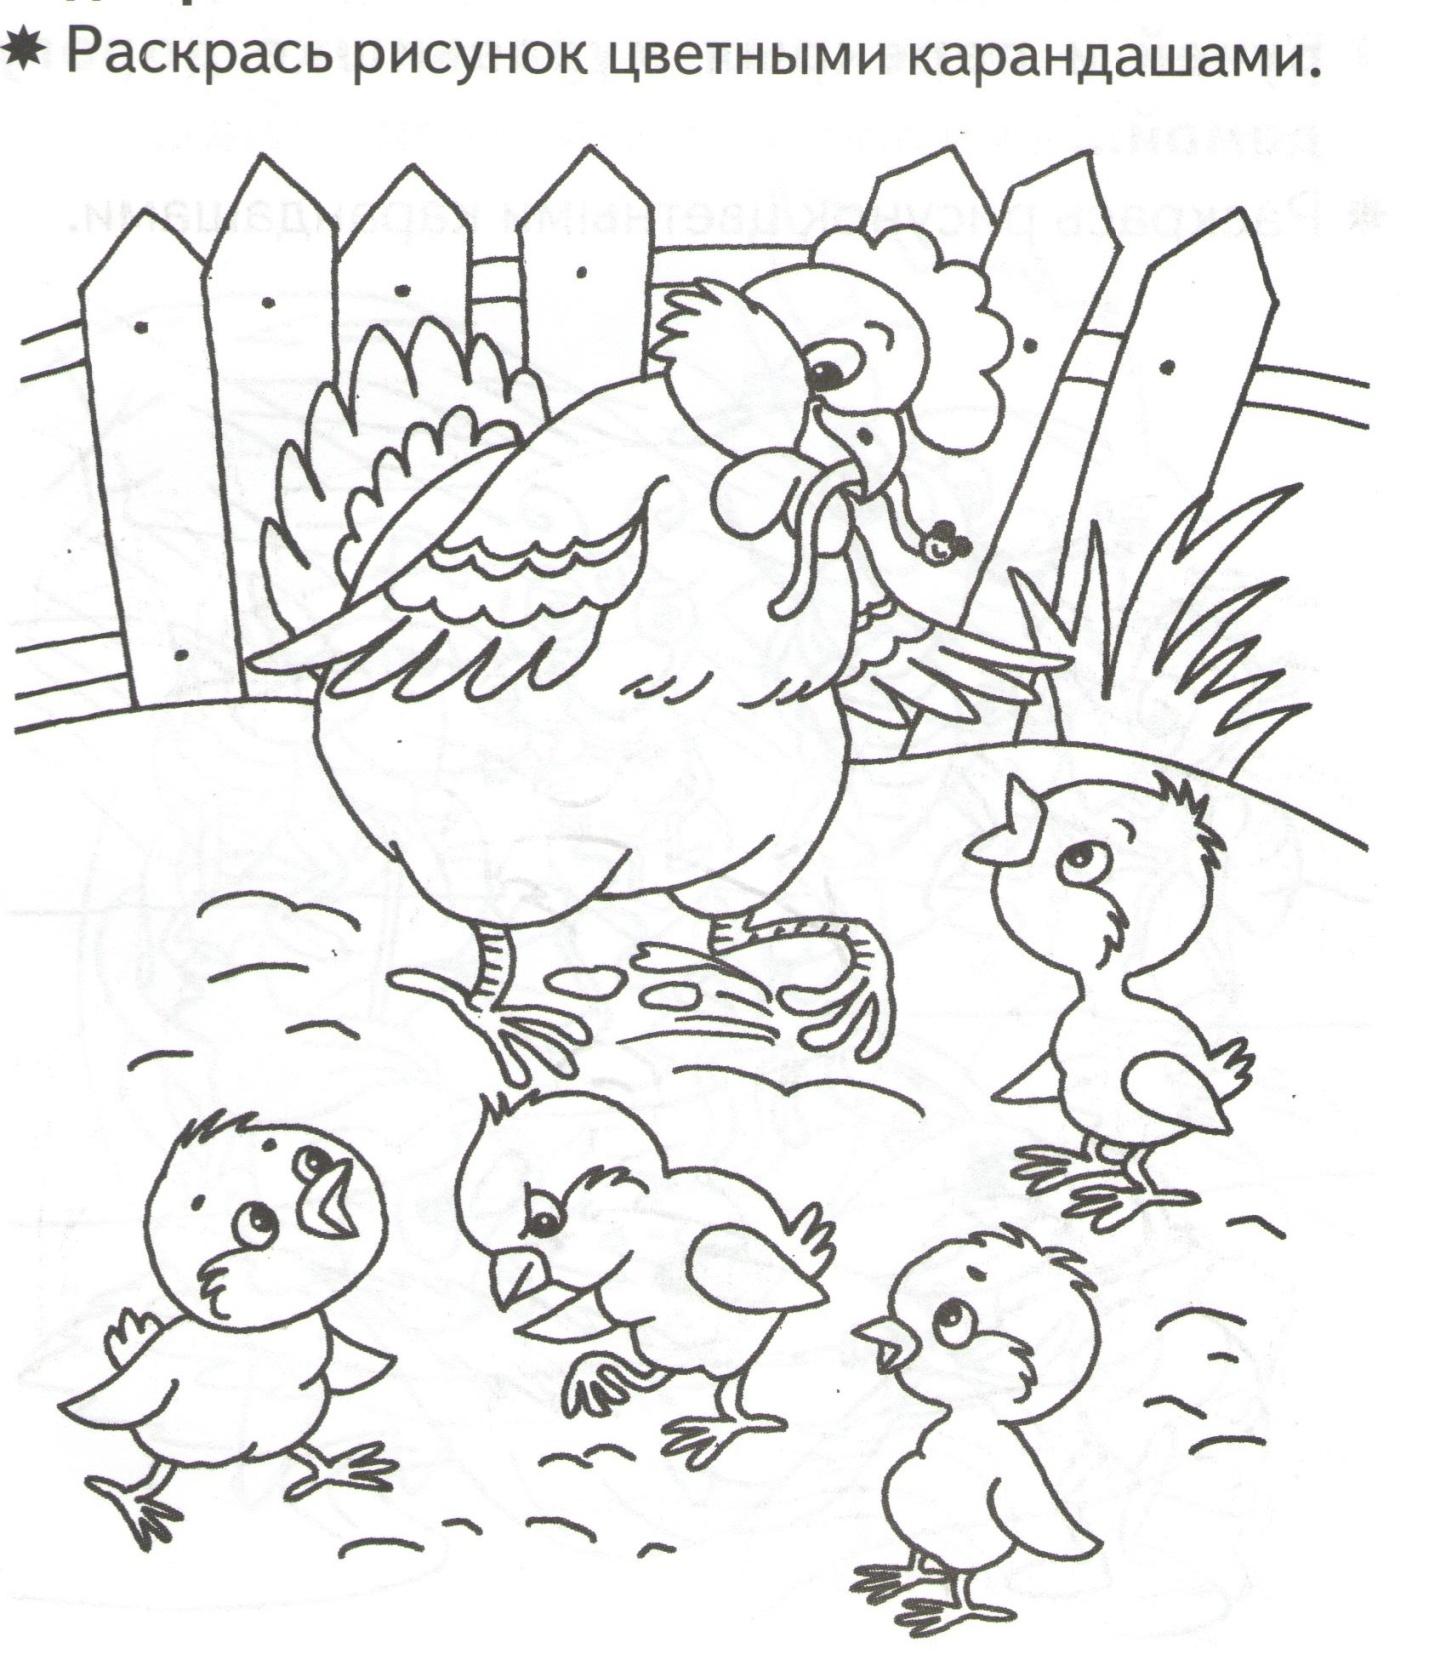 C:\Users\sisadmin\Pictures\приложения 2\2016-02-28 цыплята\цыплята 001.jpg